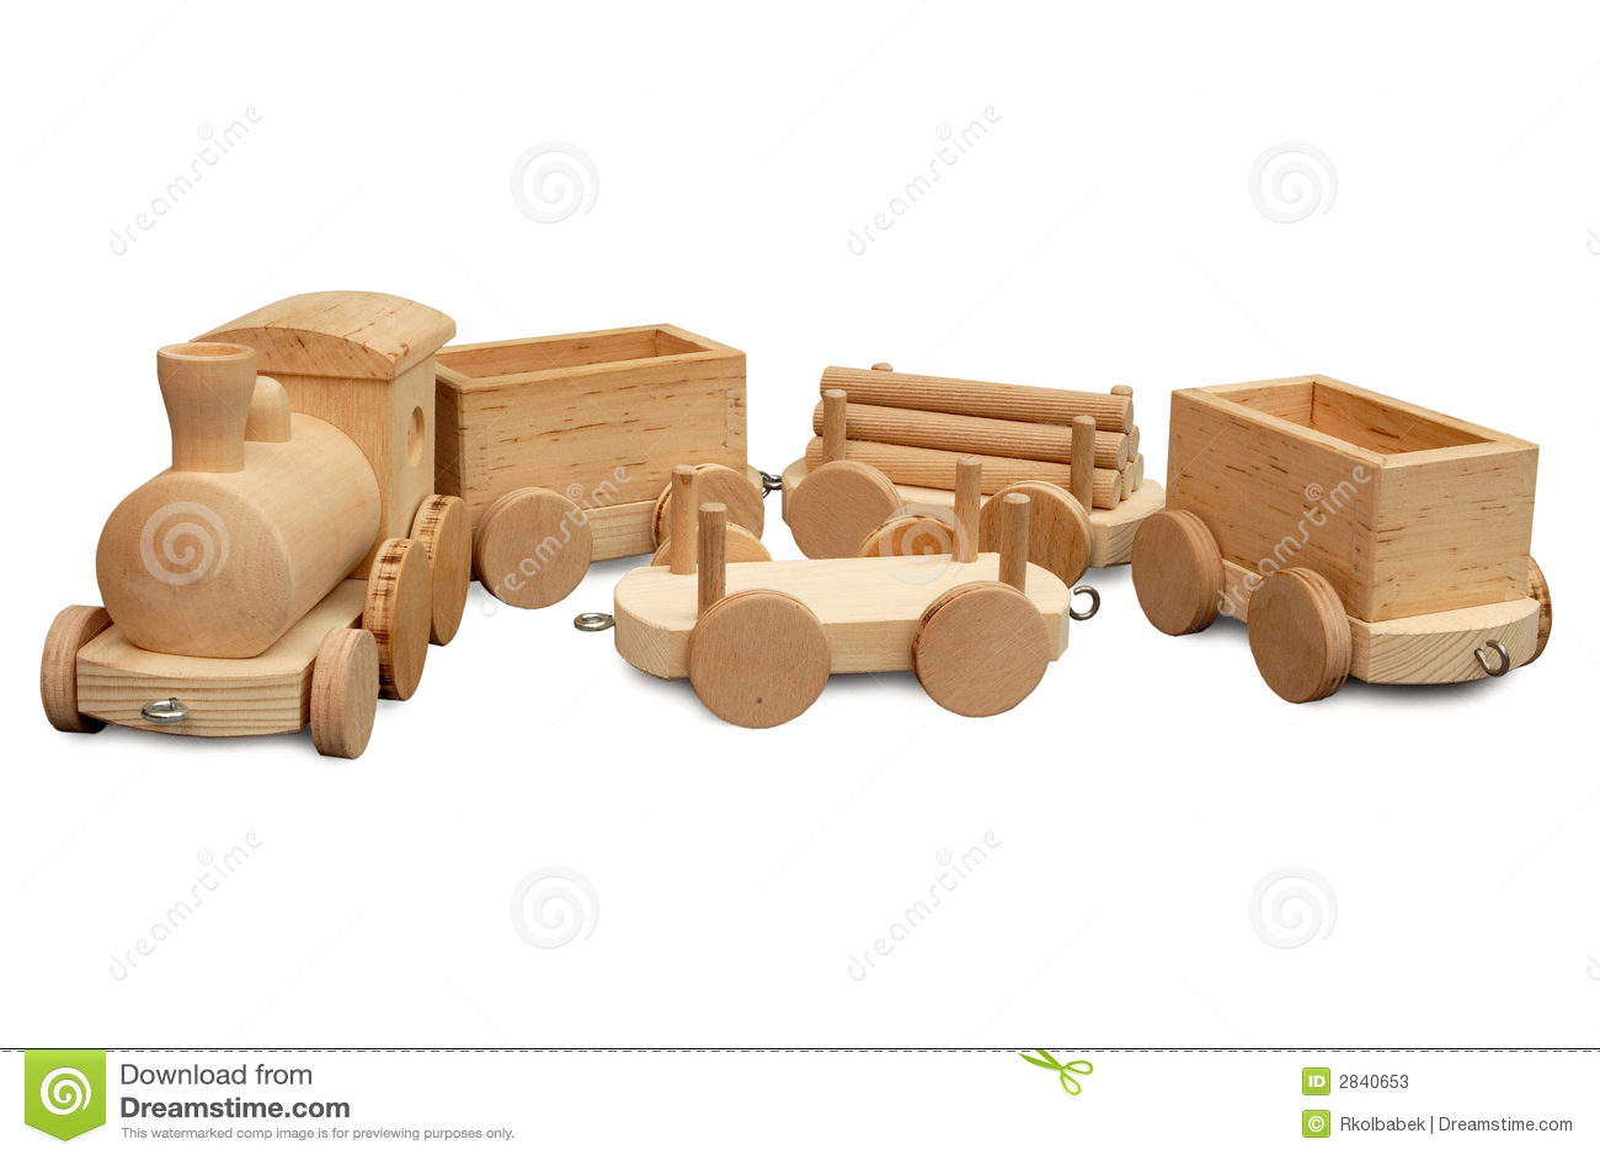 Juguete de madera fotos de archivo imagen 2840653 - Jugueteros de madera ...